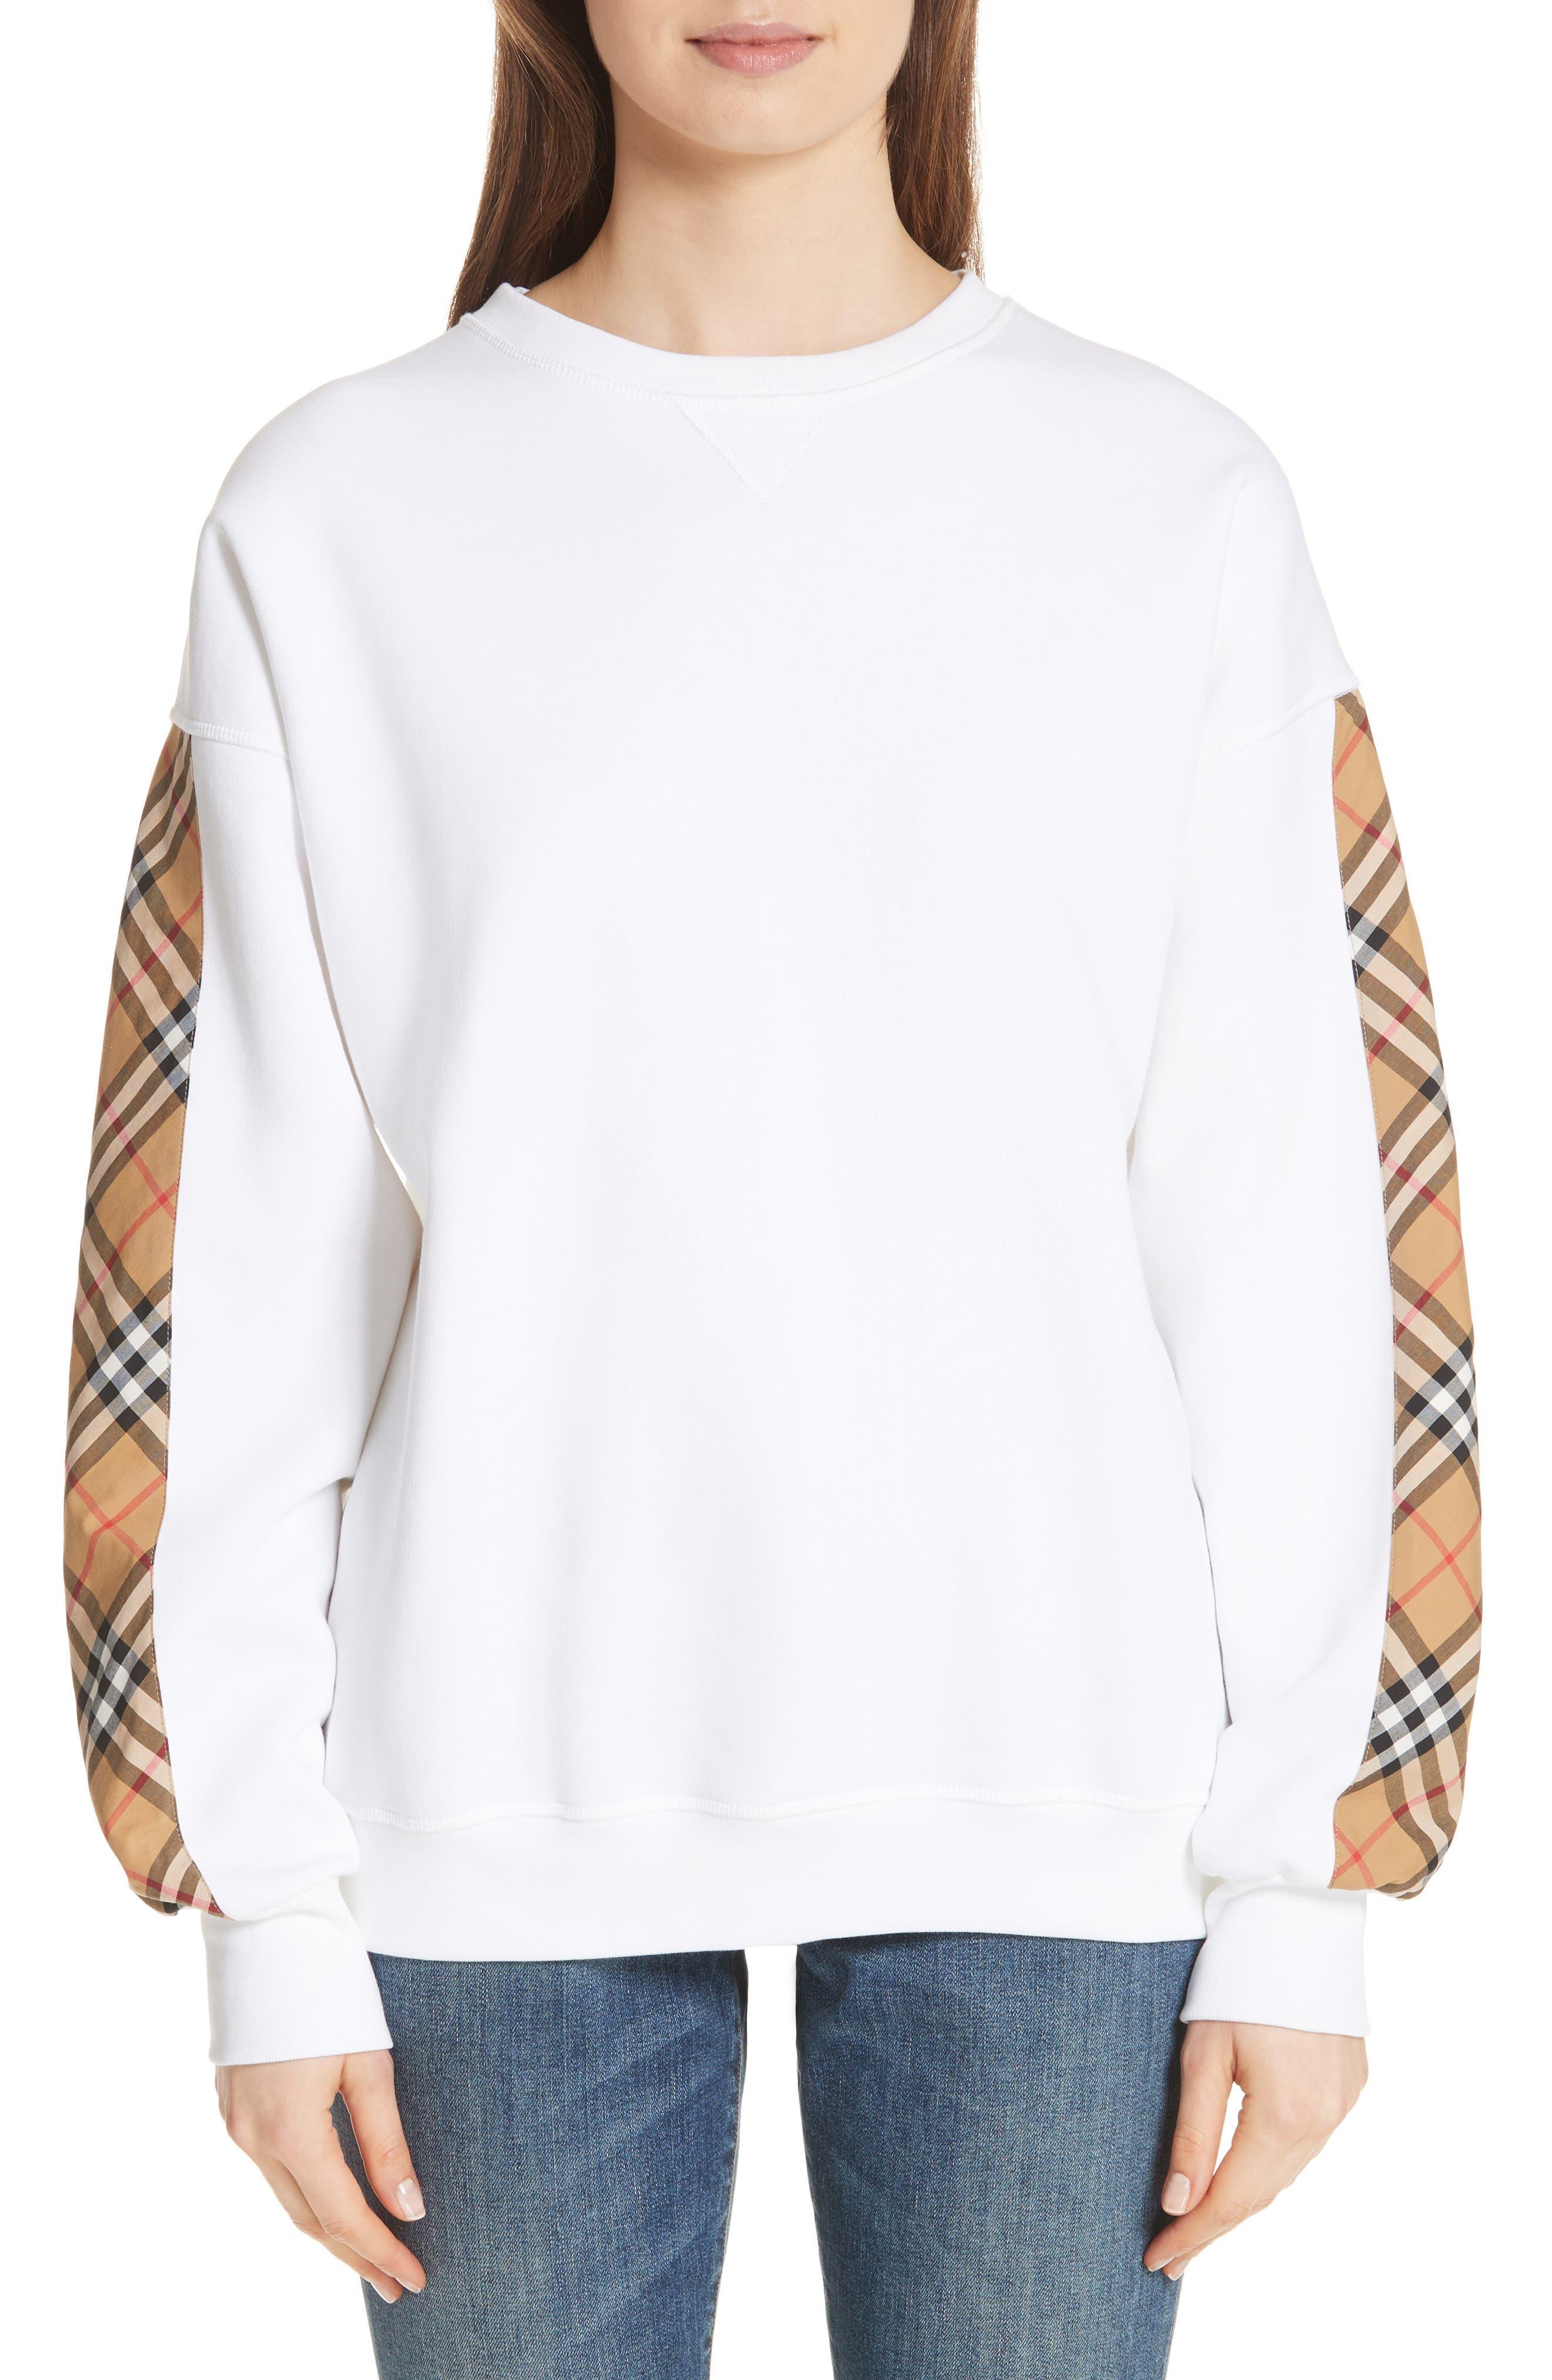 Bronx Check Sleeve Sweatshirt,                             Main thumbnail 1, color,                             WHITE